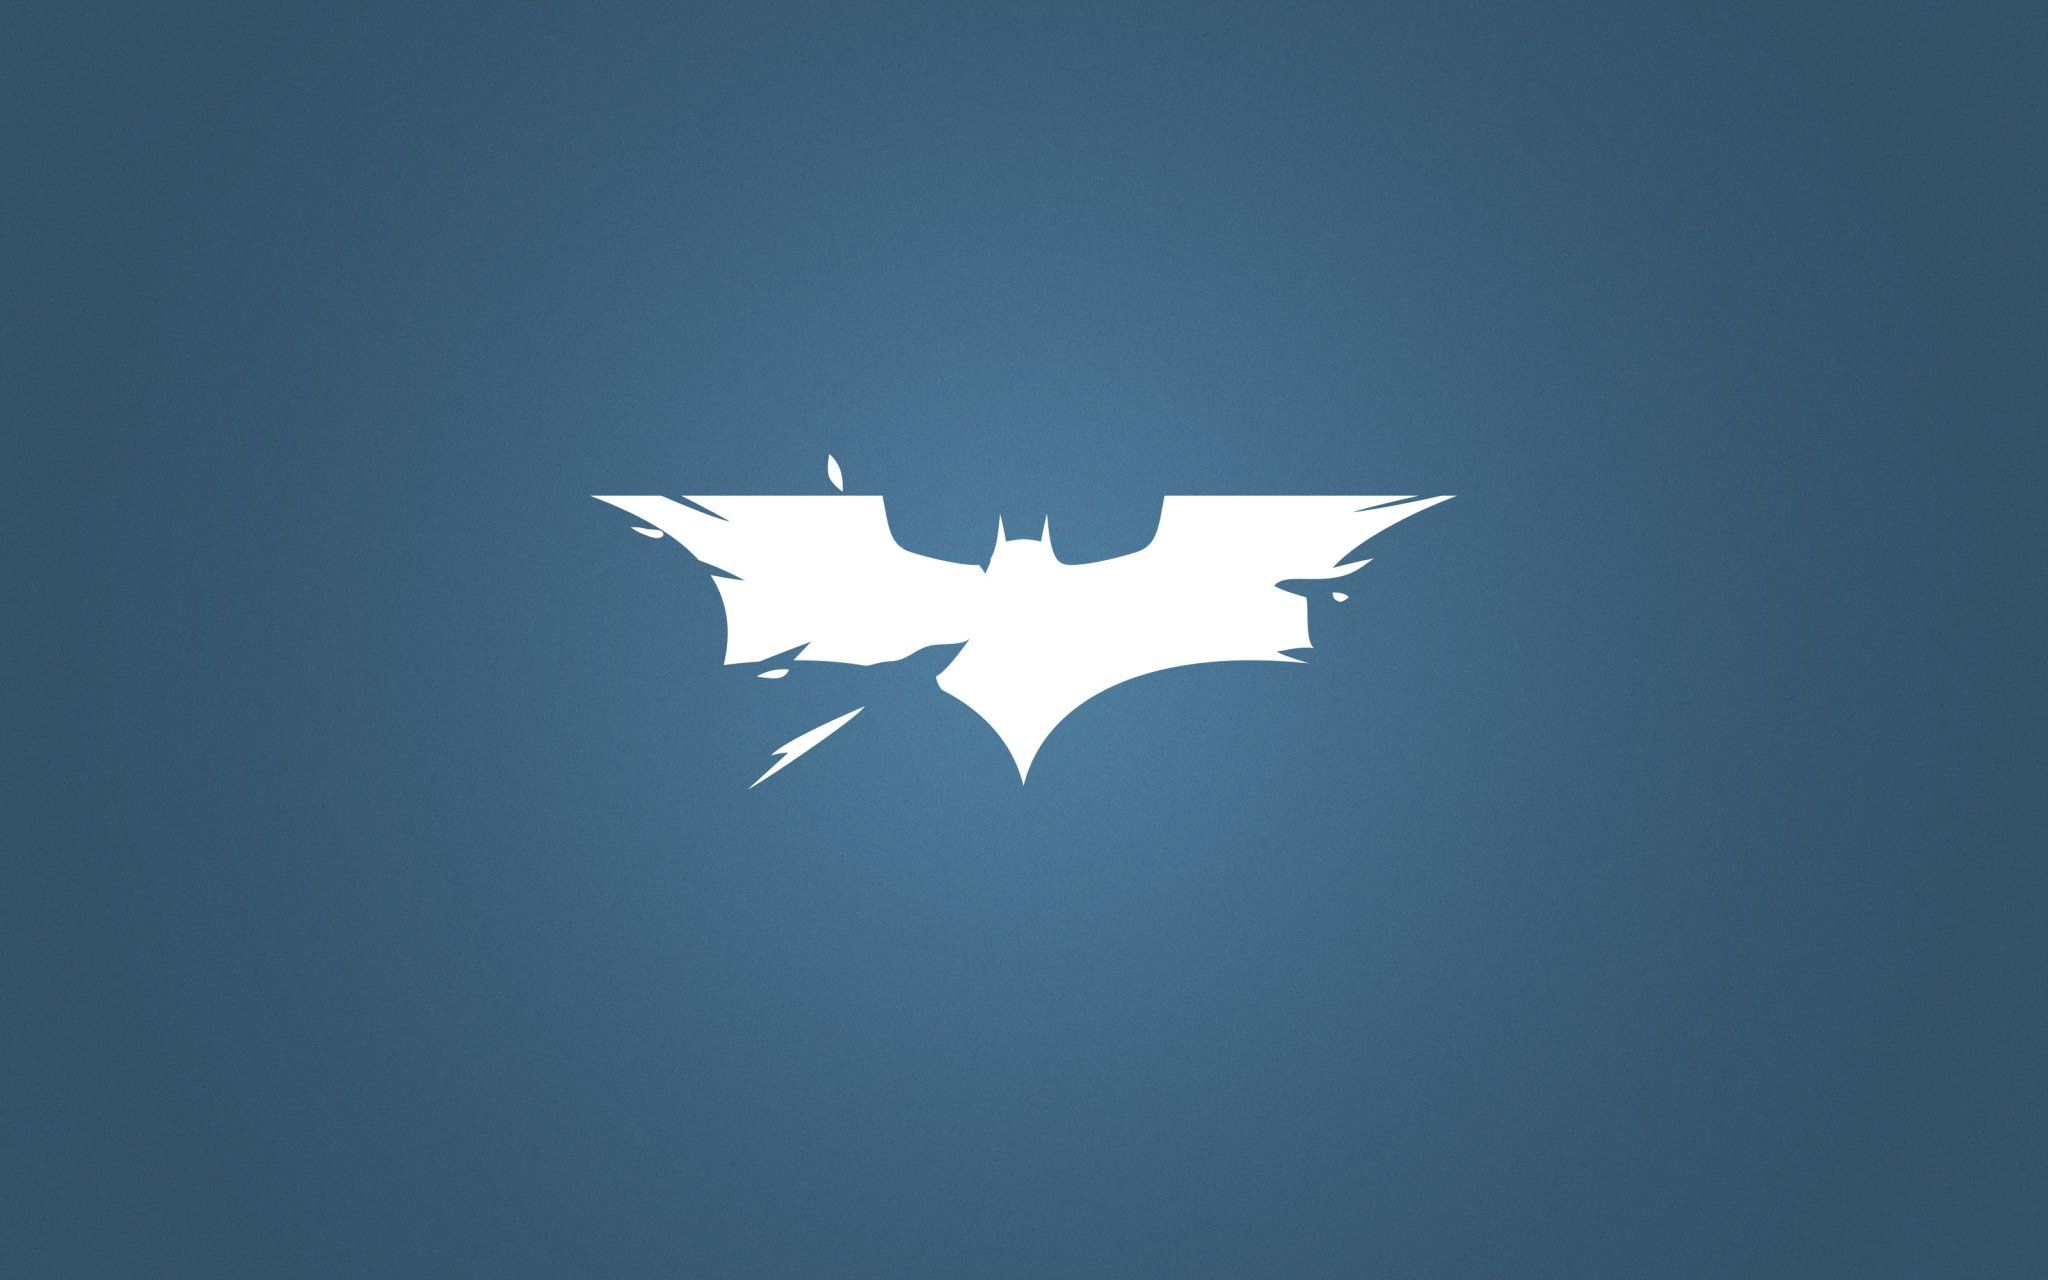 Batman Logo Wallpapers Mobile Is 4k Wallpaper Batman Wallpaper 4k Wallpaper For Mobile Minimalist Wallpaper